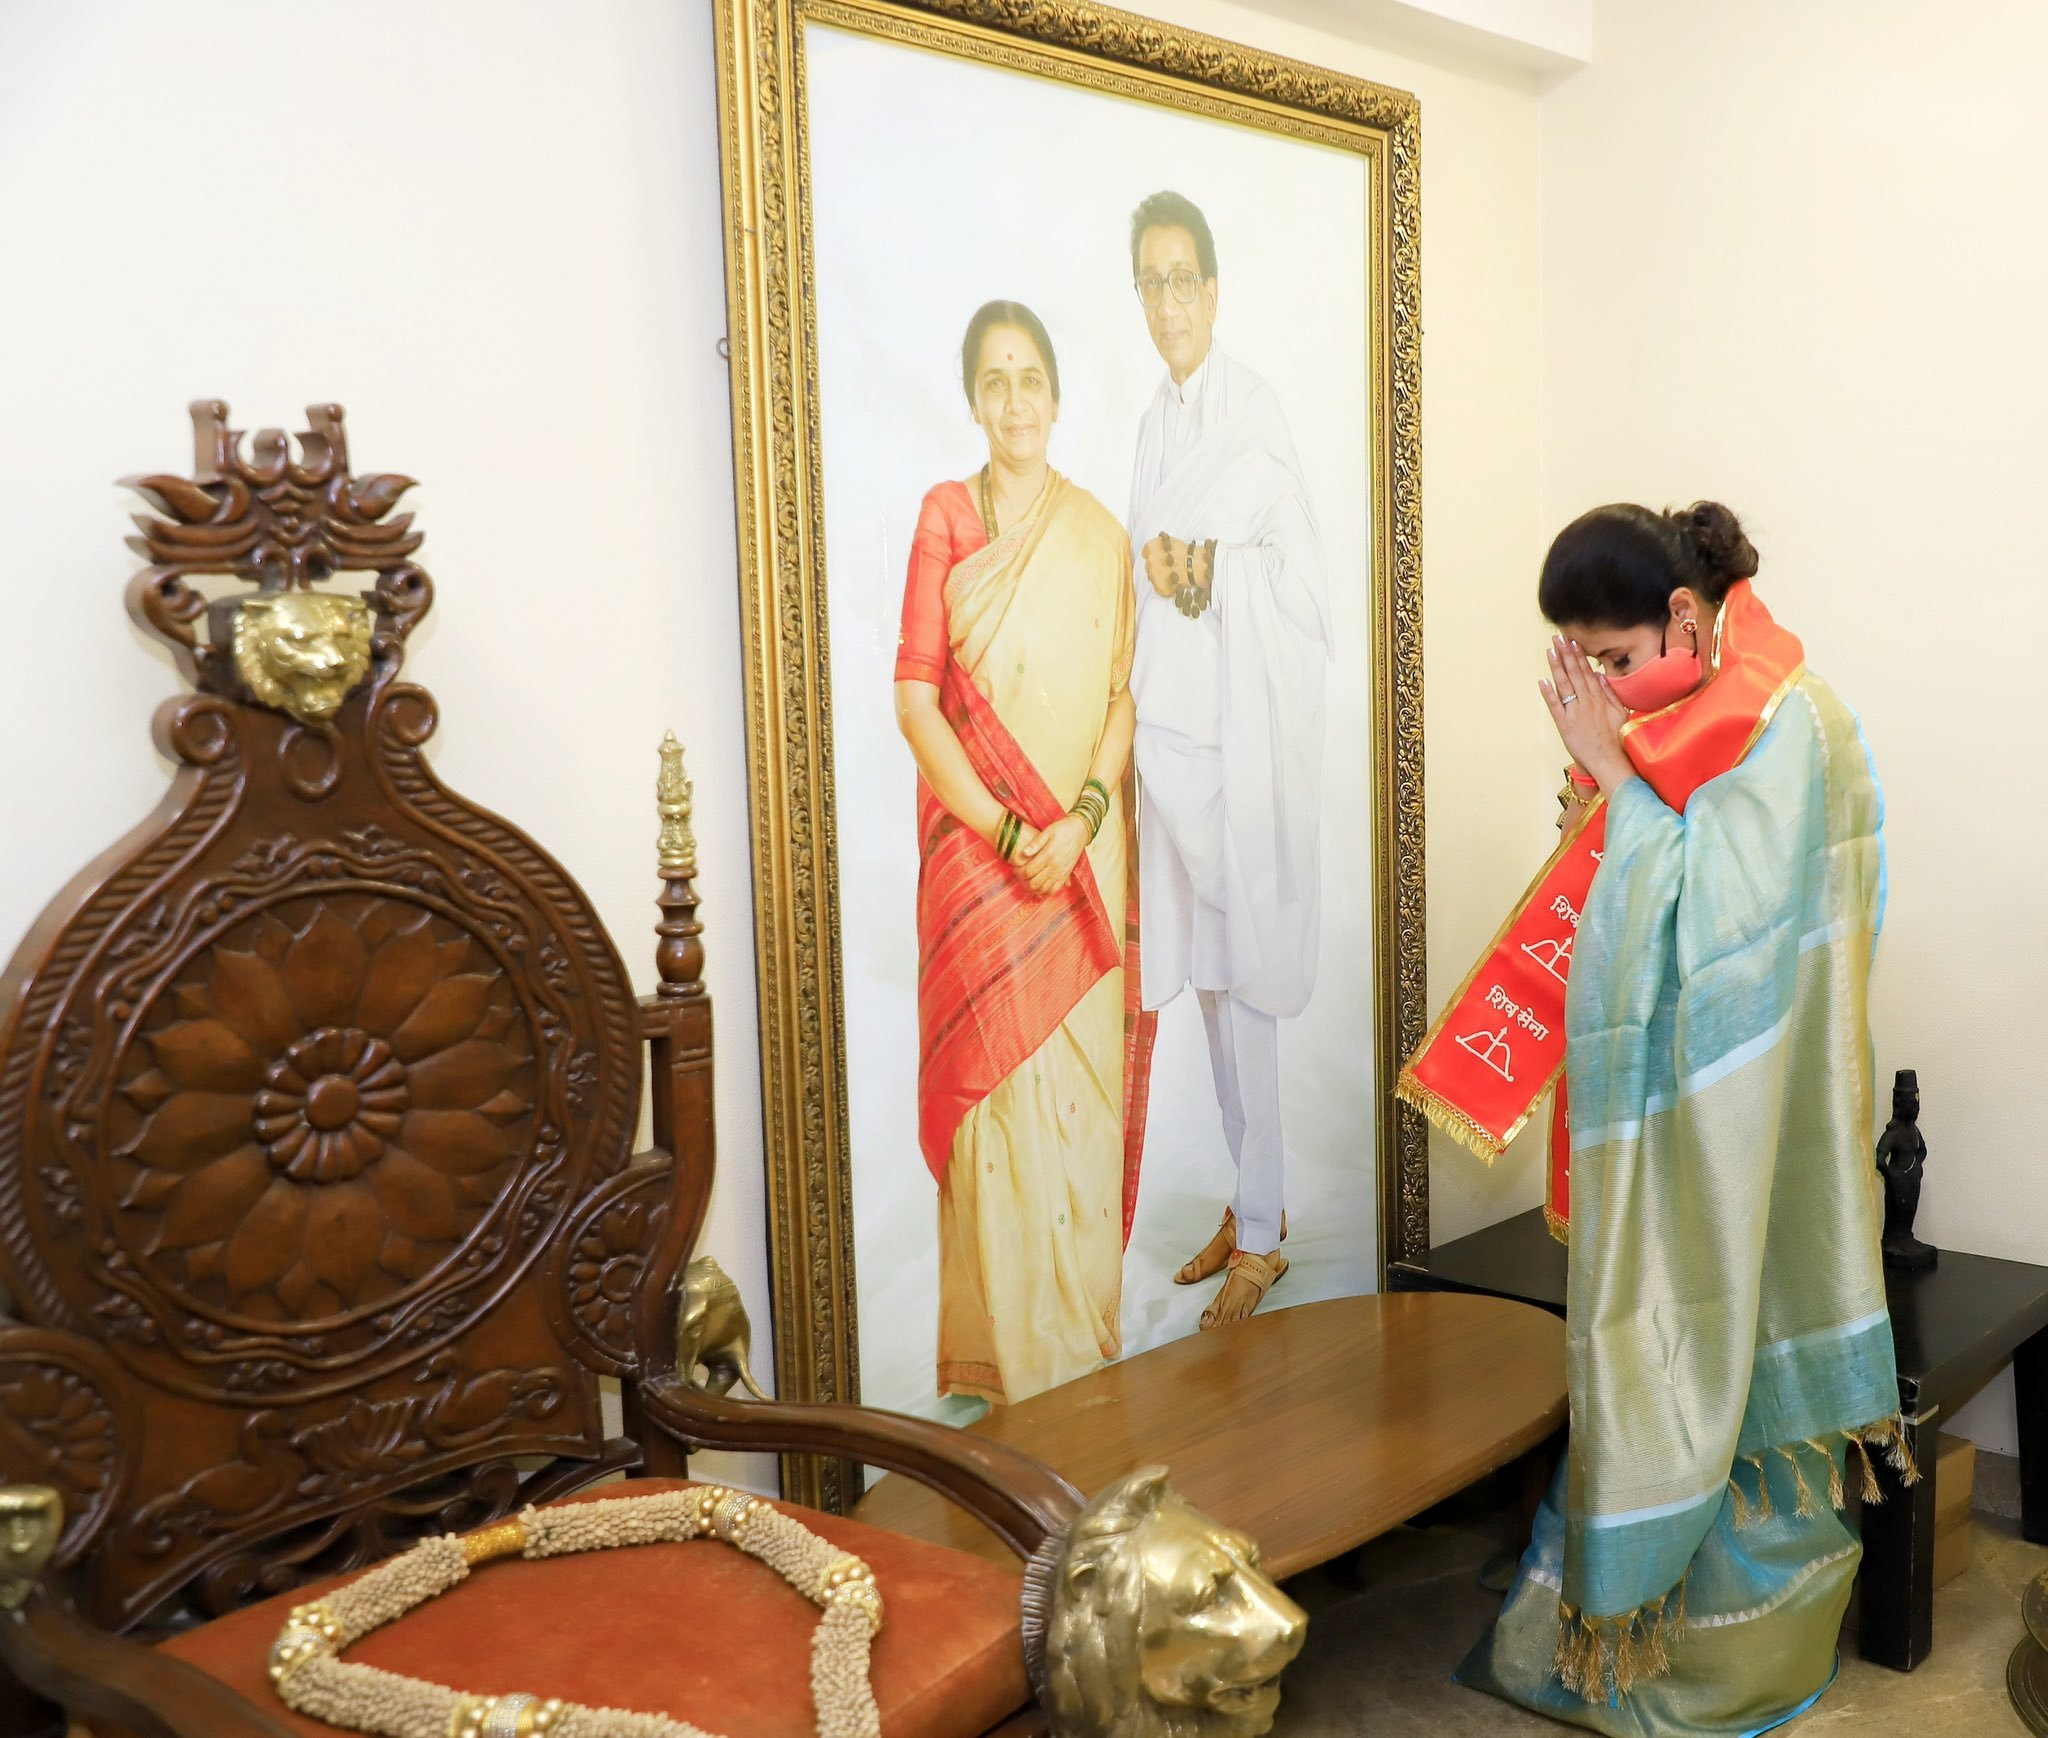 After Lok Sabha elections 2019 defeat, Urmila Matondkar, who resigned from Congress, joined Shiv Sena in the presence of Uddhav Thackeray.